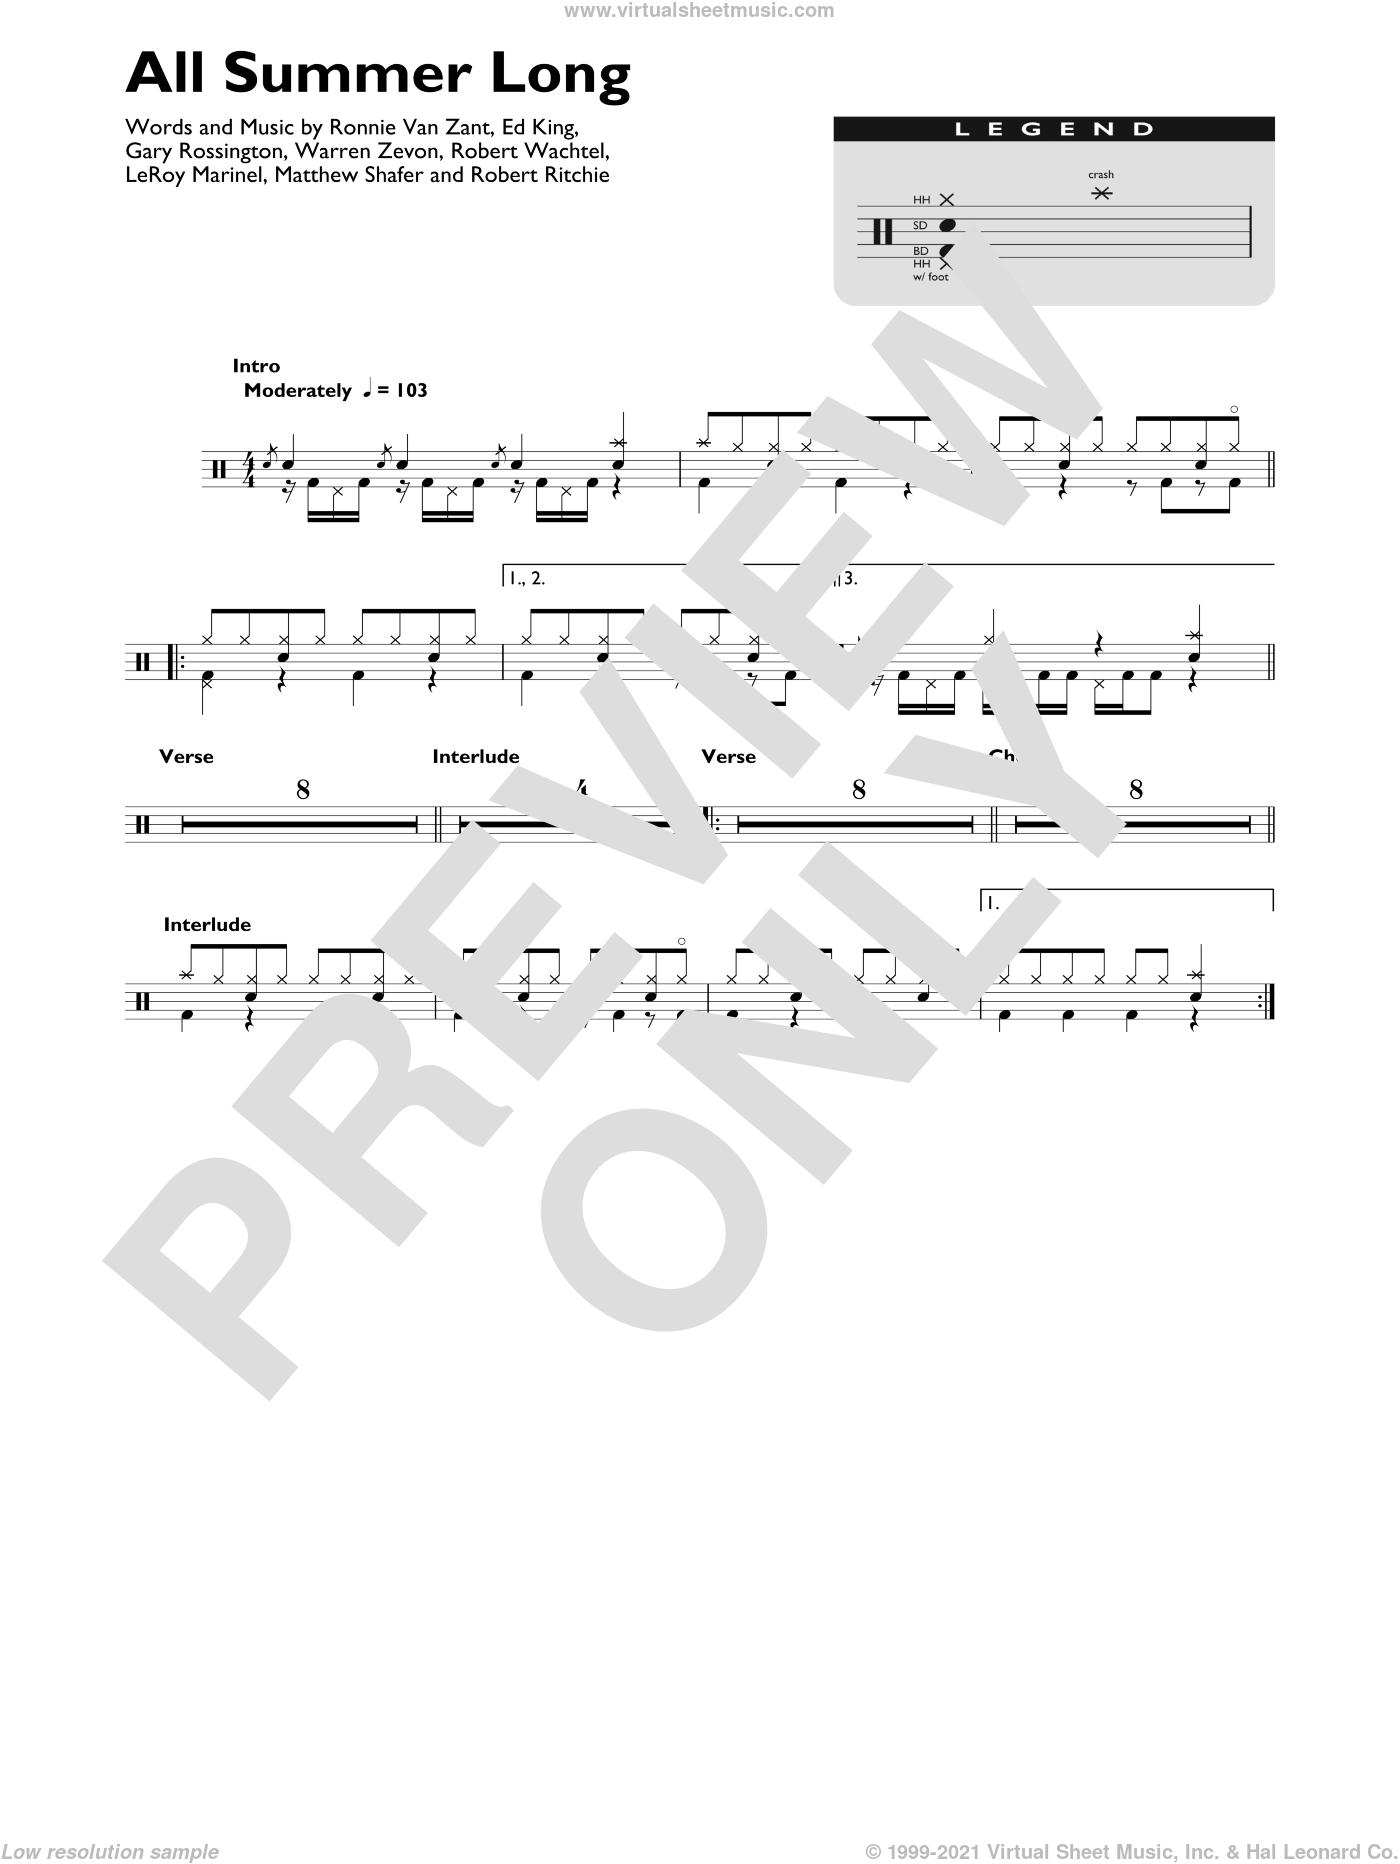 All Summer Long sheet music for drums (percussions) by Kid Rock, Edward King, Gary Rossington, KeRoy Marinel, Matthew Shafer, Robert Ritchie, Robert Wachtel, Ronnie Van Zant and Warren Zevon, intermediate skill level